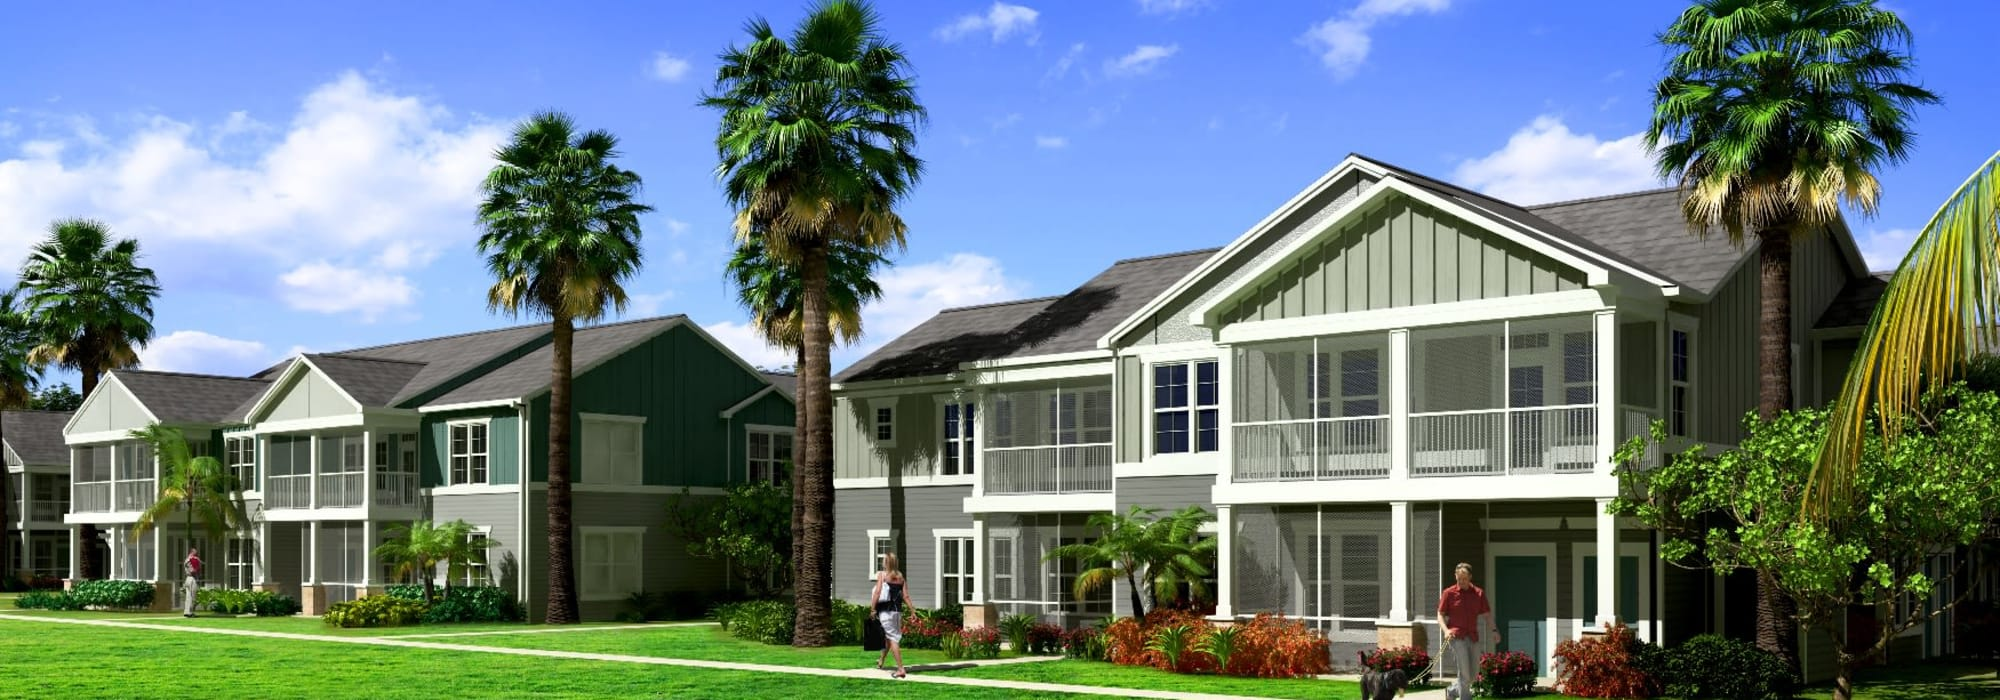 Apartments at Springs at Port Orange in Port Orange, Florida